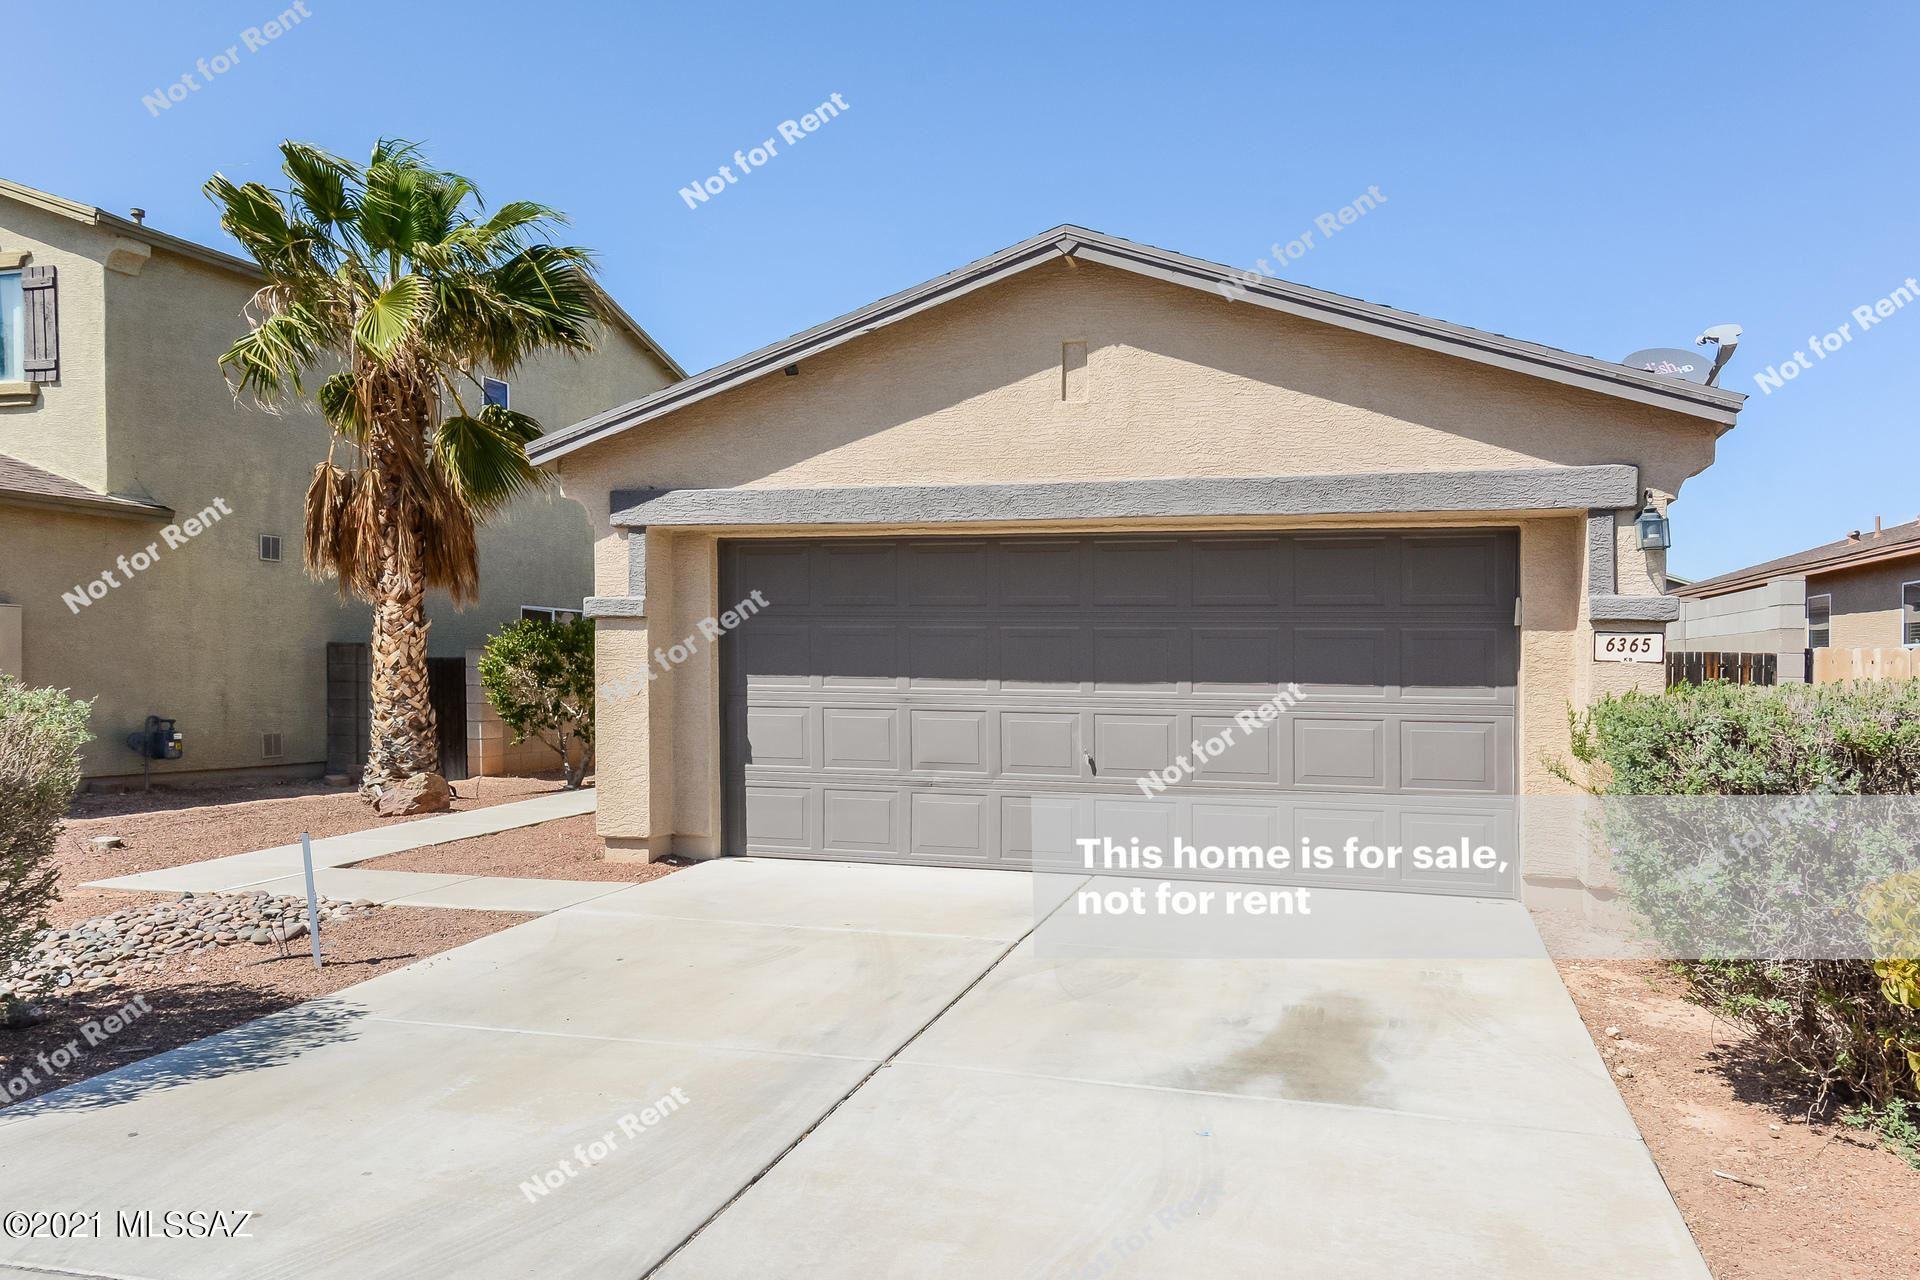 6365 S Sunrise Valley Drive, Tucson, AZ 85706 - MLS#: 22111582